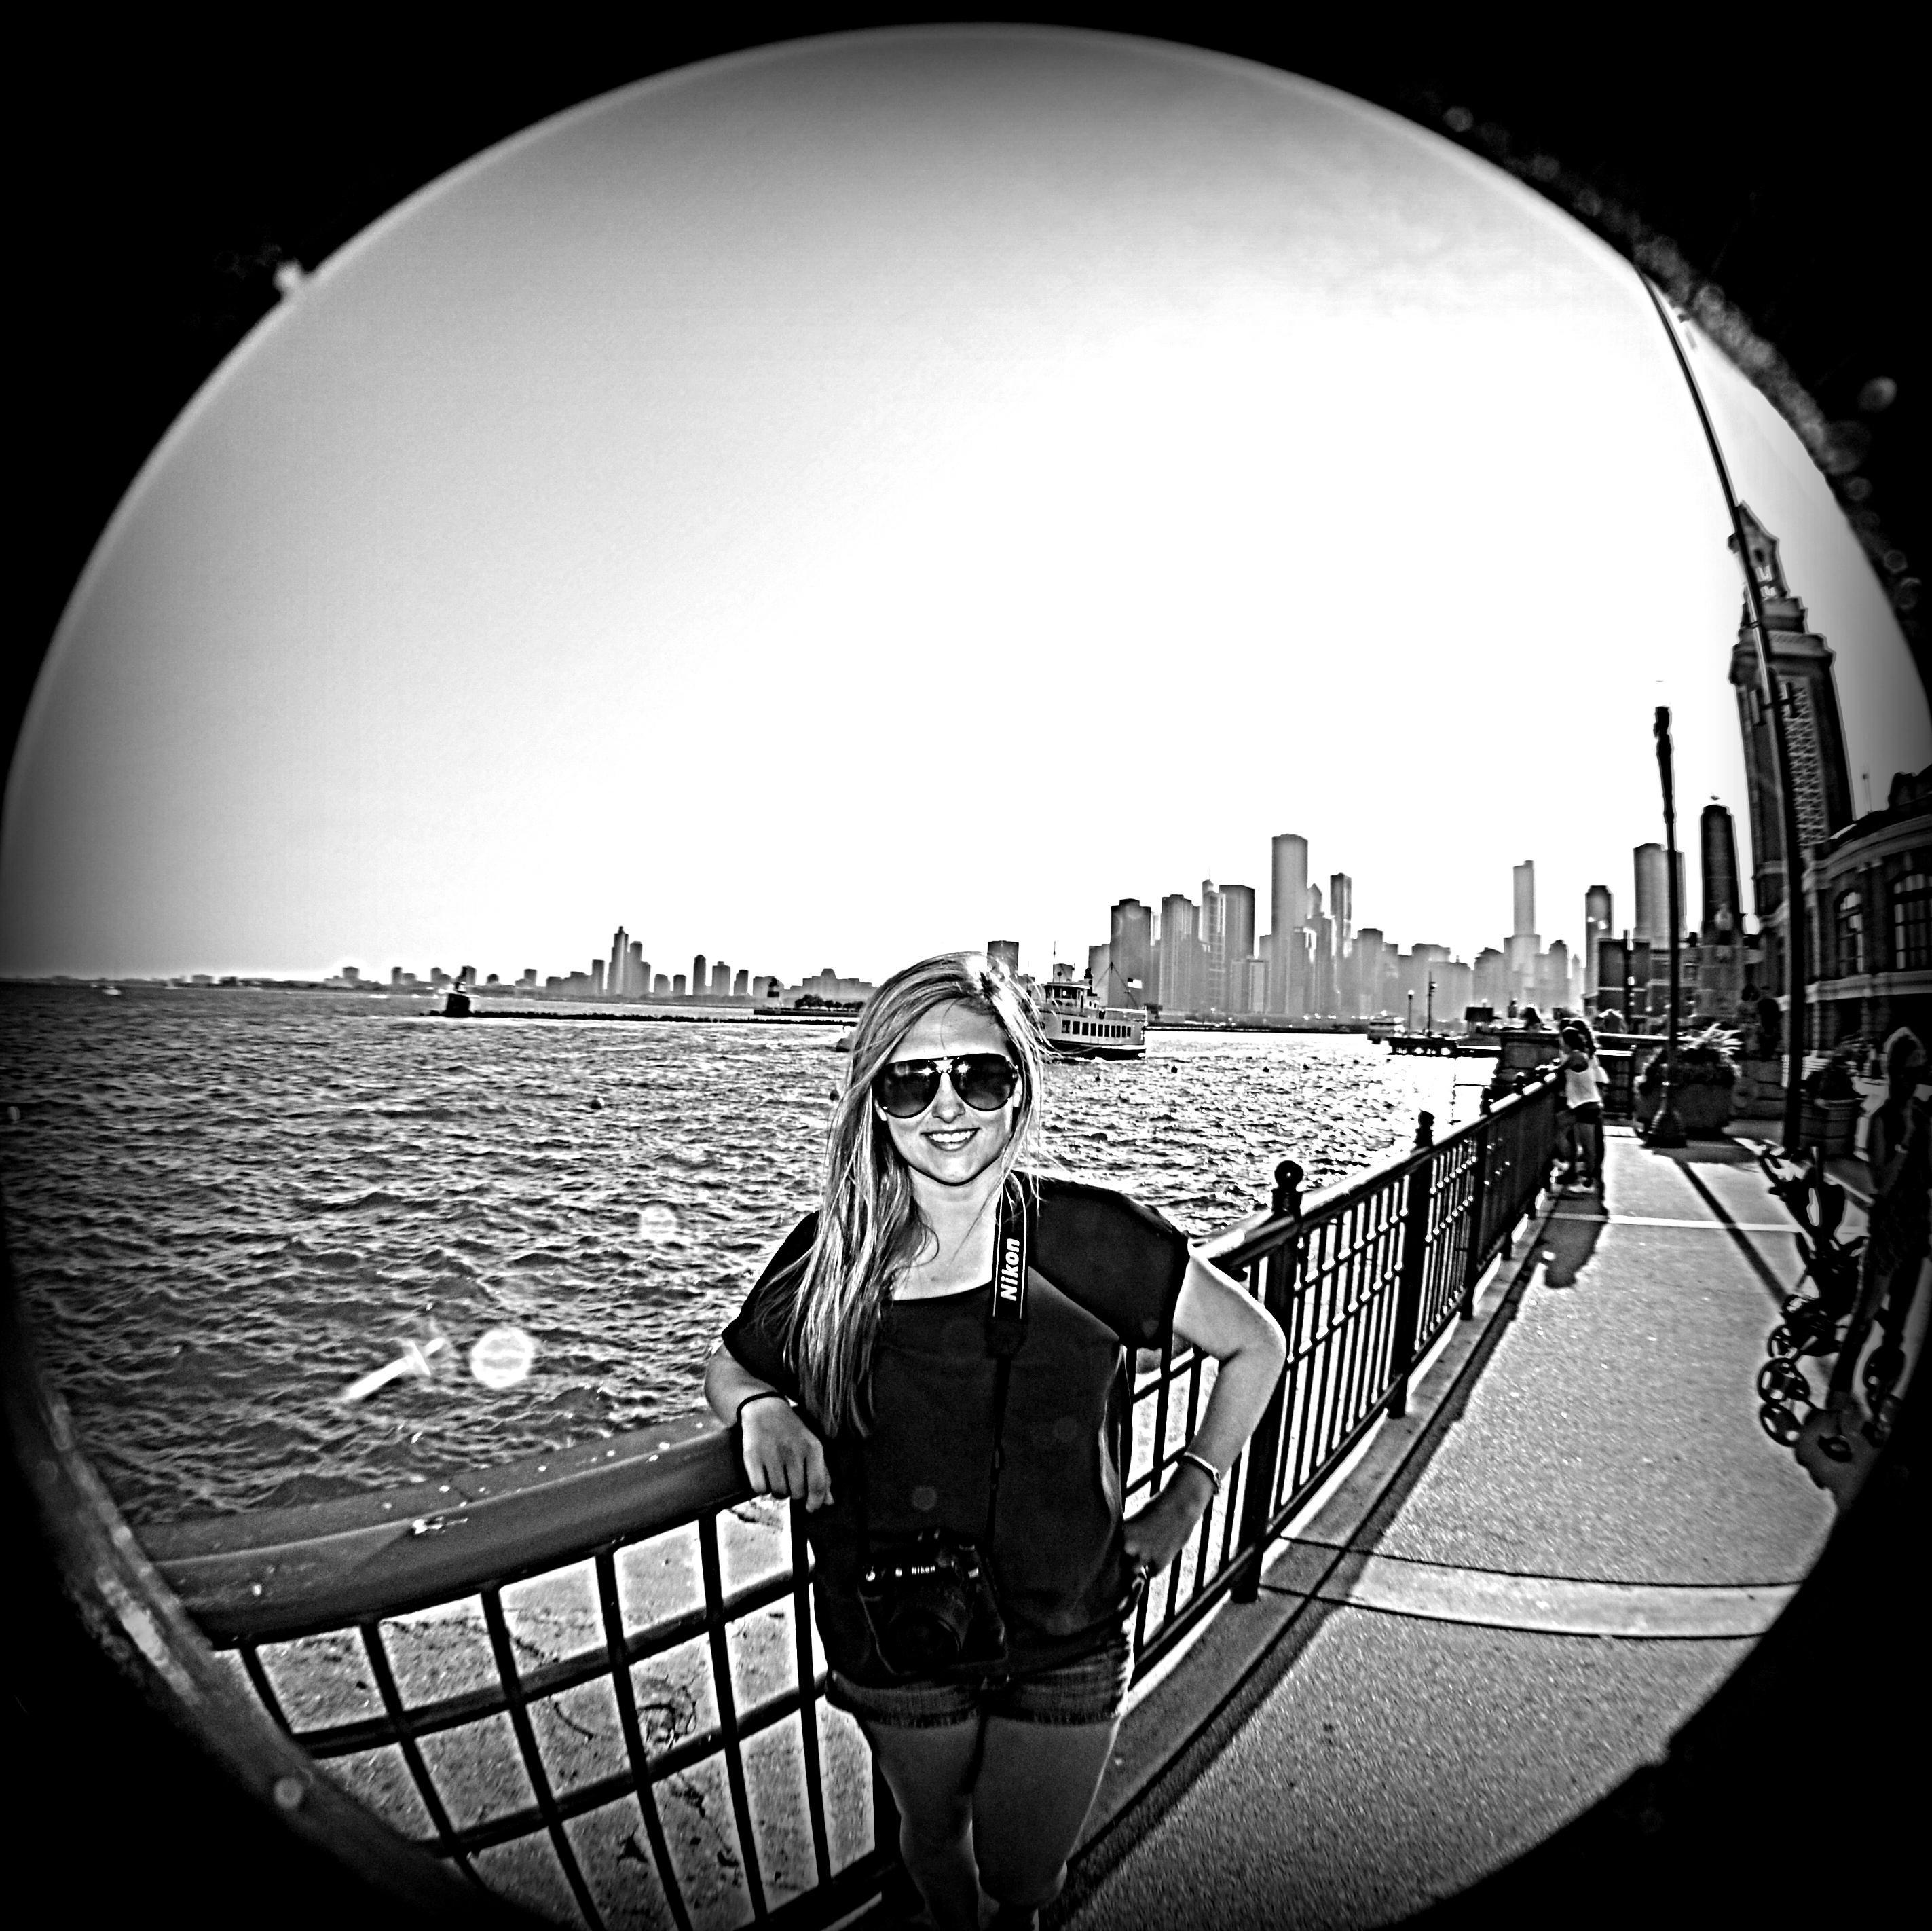 TaylorJewelRyan's Profile Picture